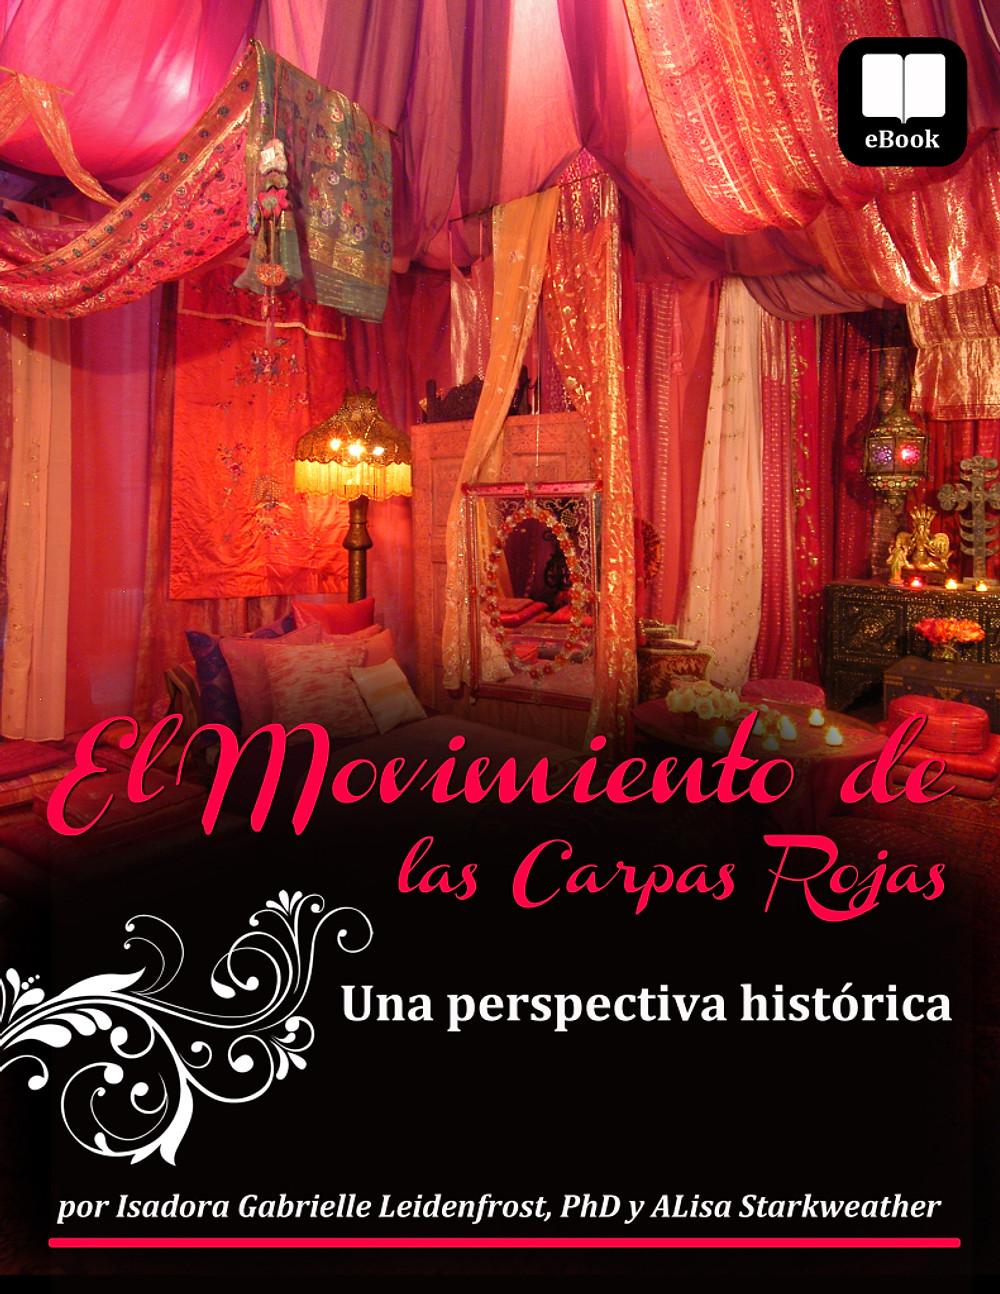 eBook-cover(spanish)